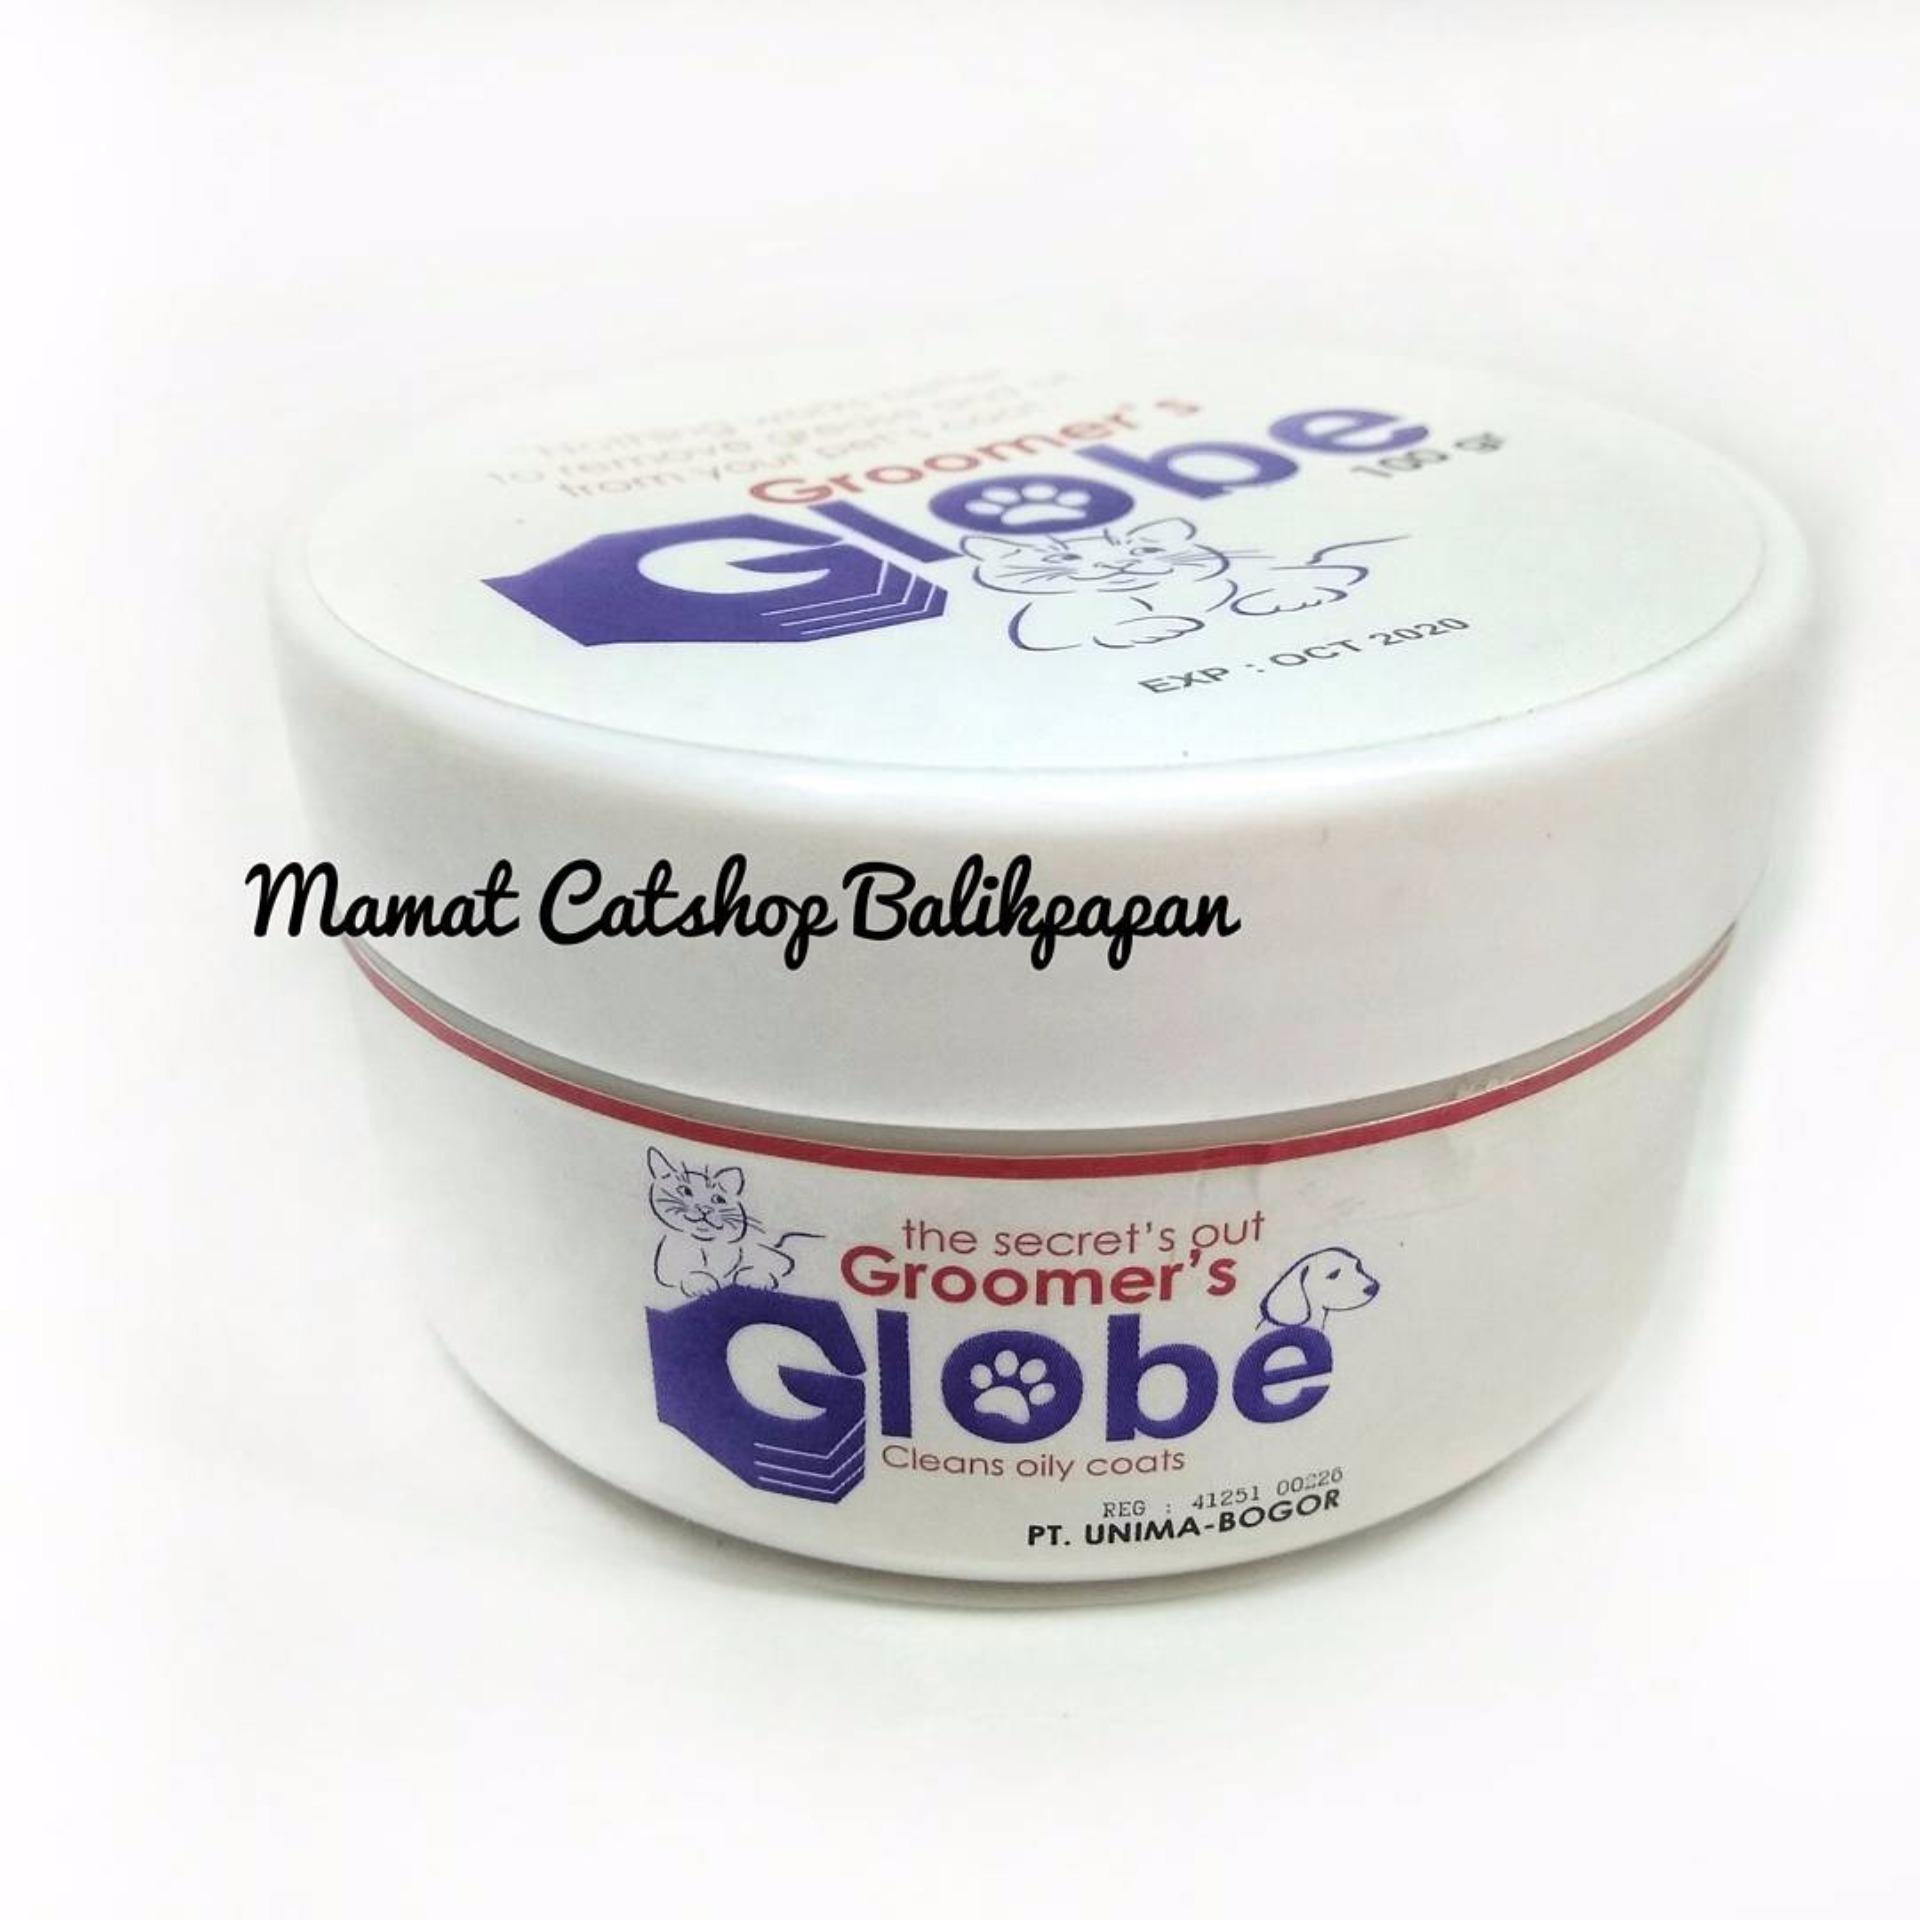 Globe Groomer penghilang minyak pada bulu hewan 100 gram